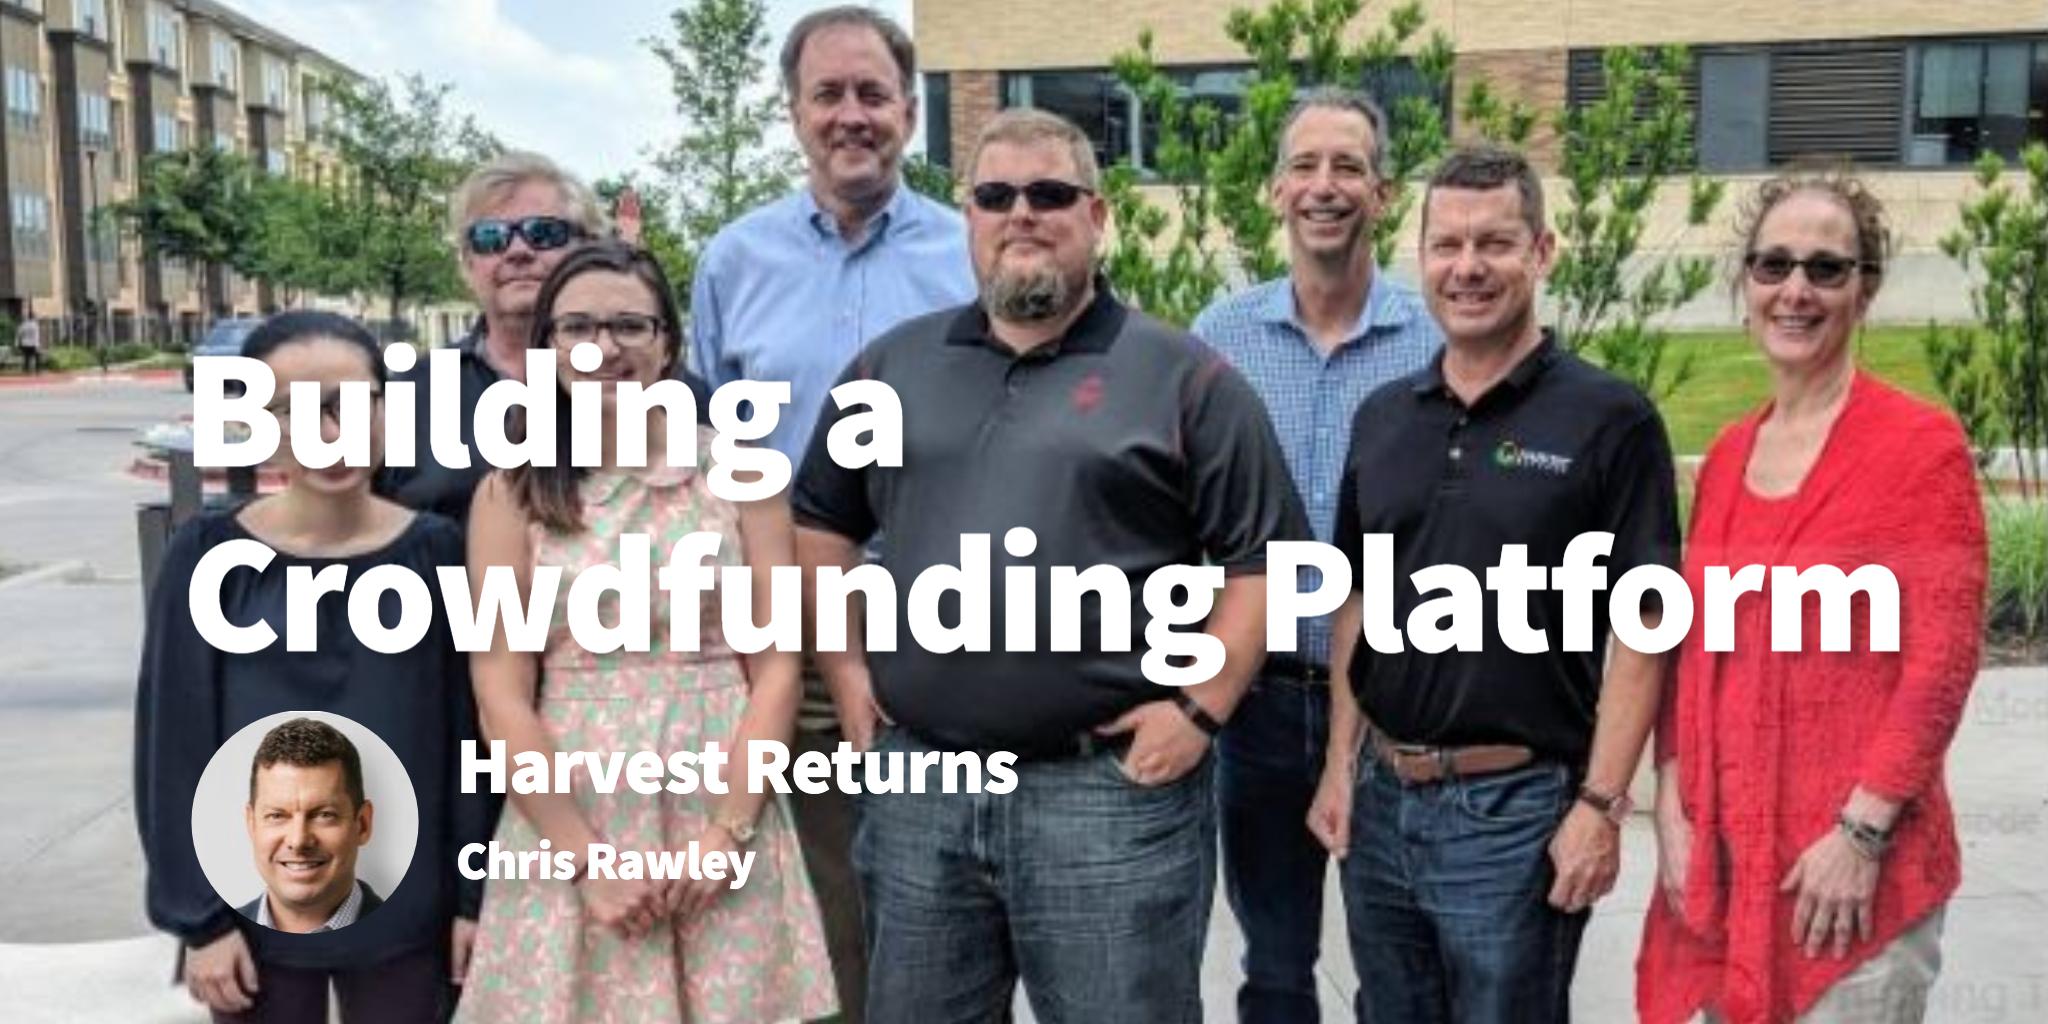 Harvest Returns Chris Rawley